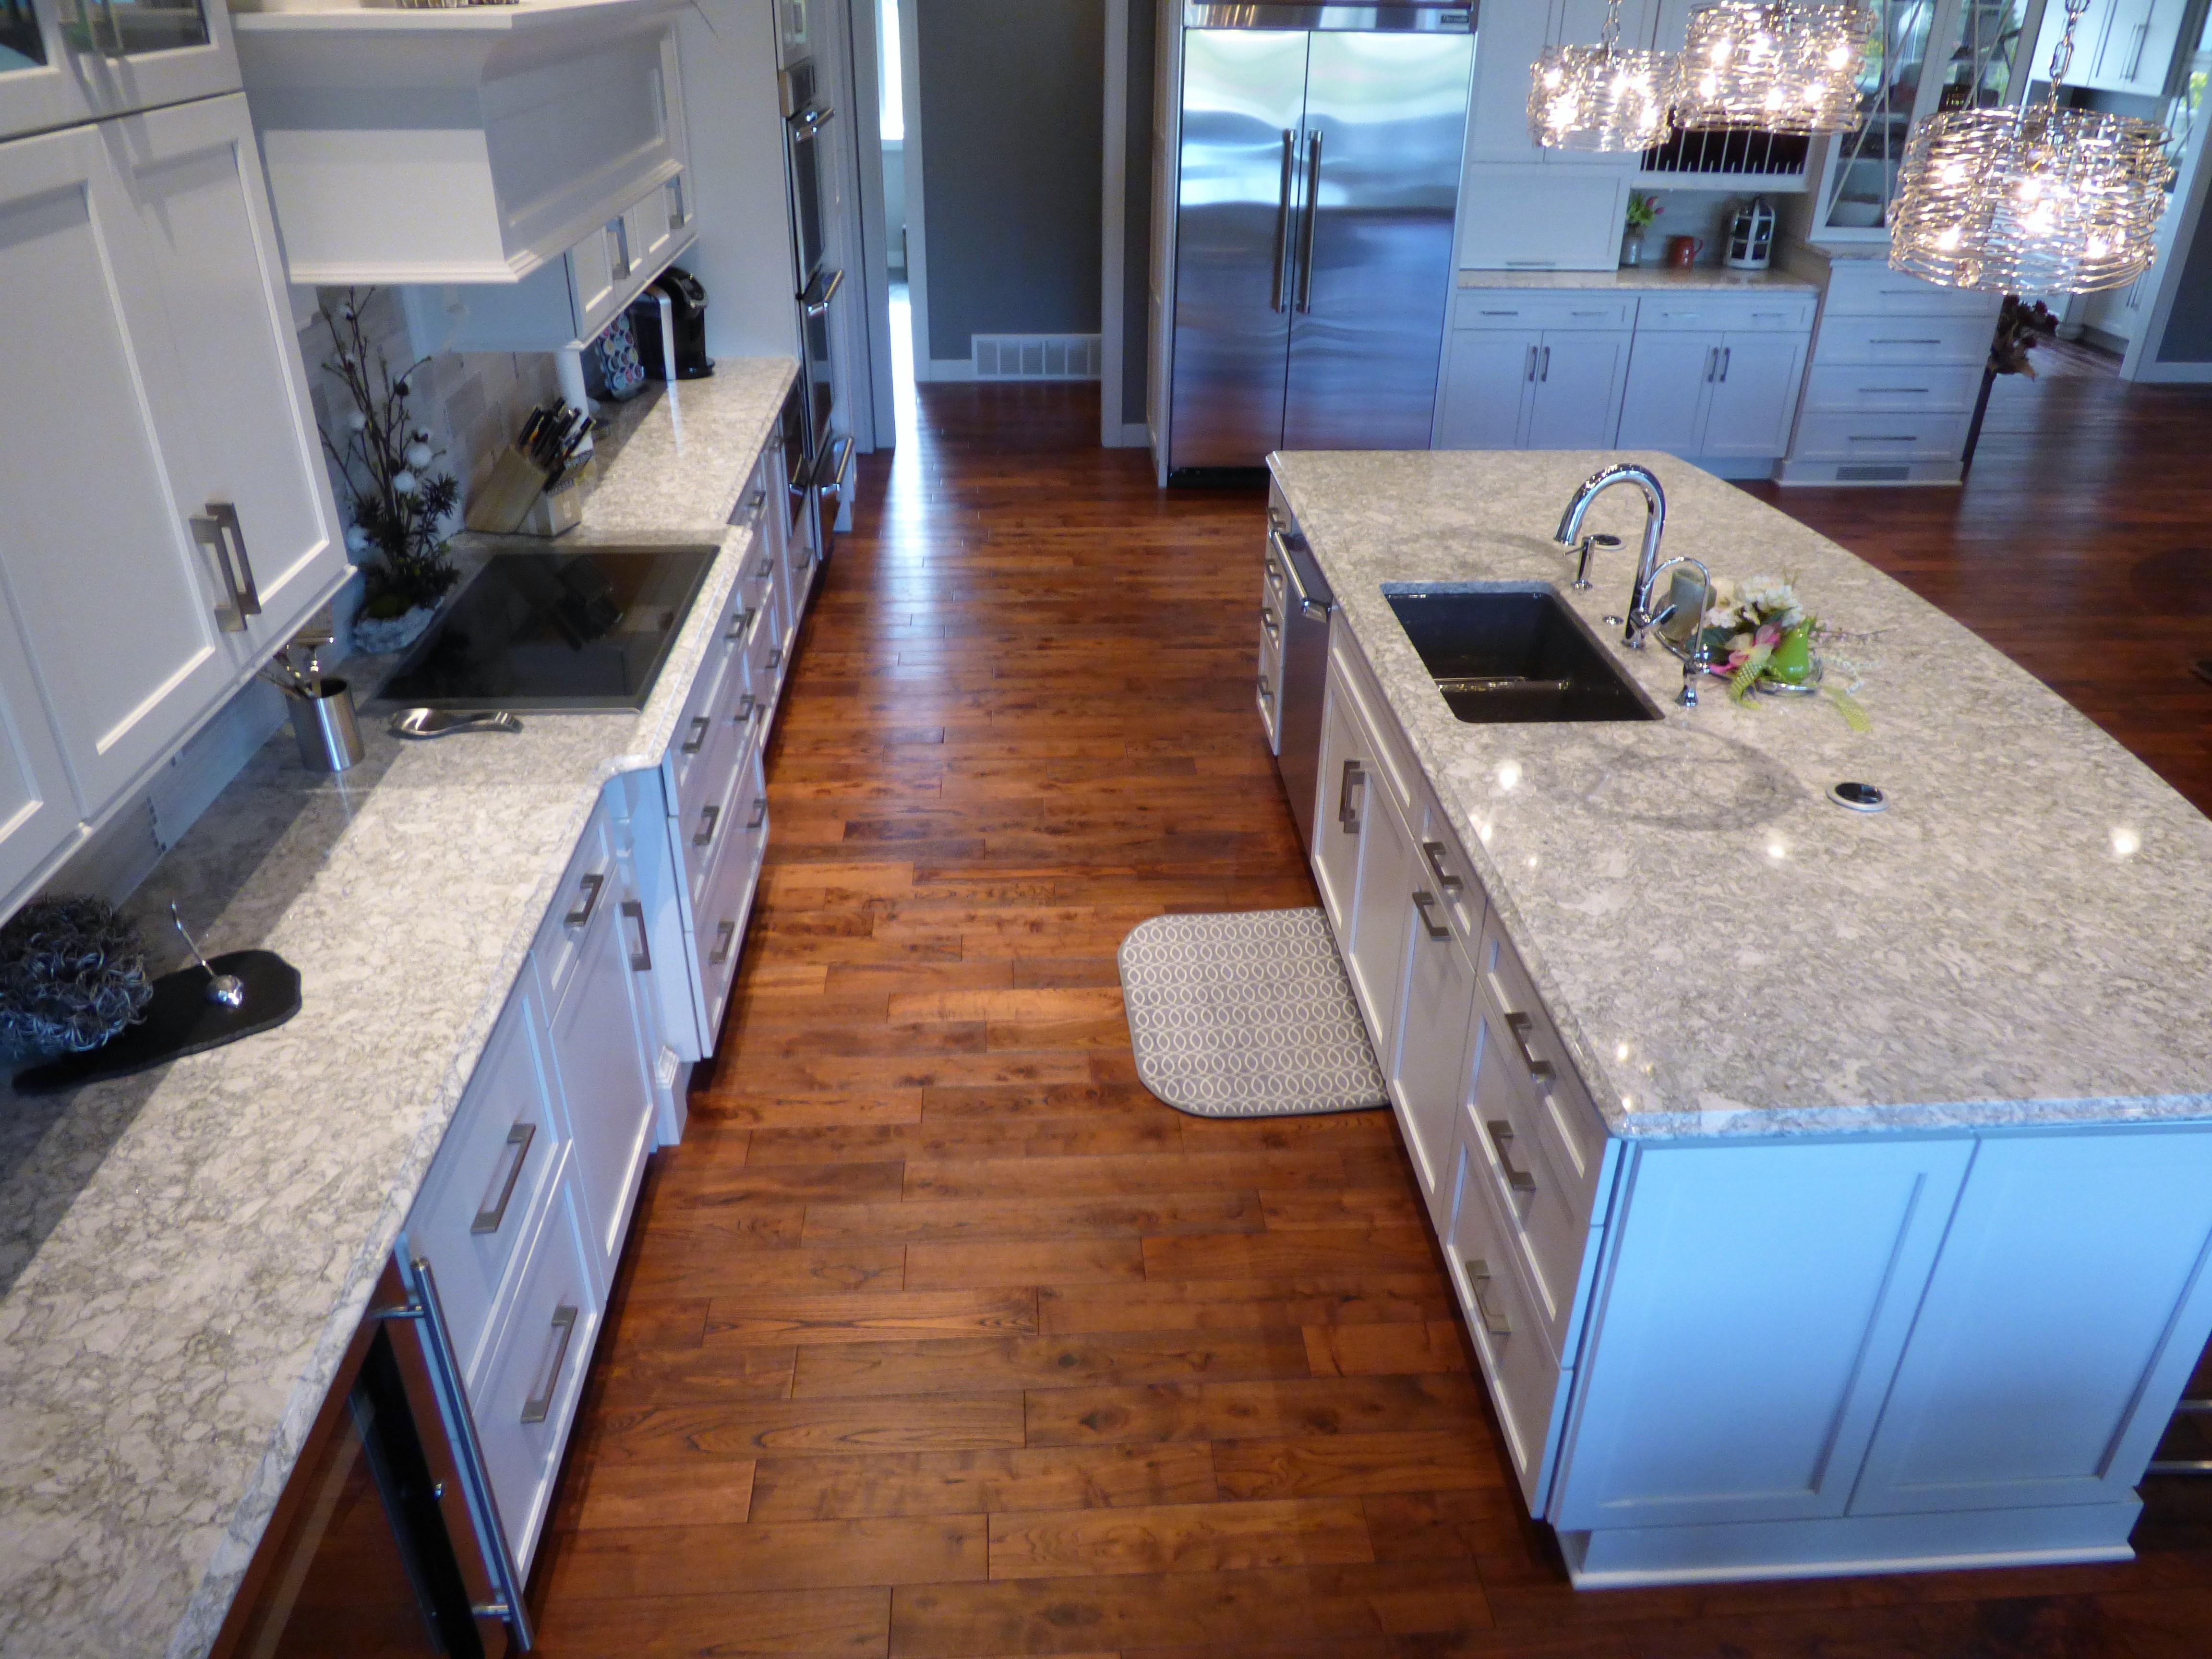 new kitchen sparkle pin countertop countertops quay white diamond quartz with of